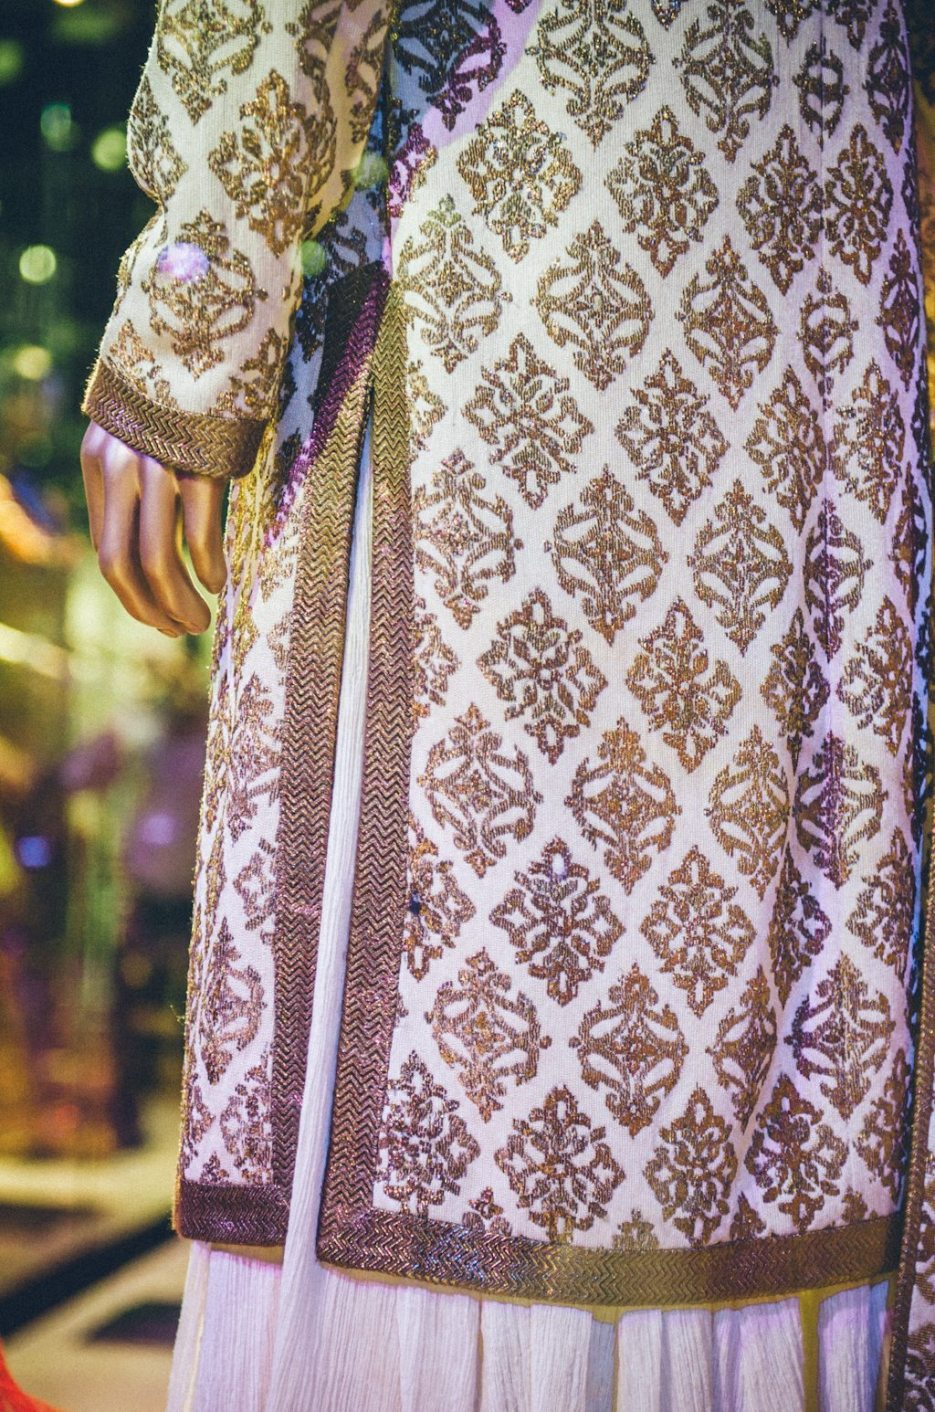 Tarun-Tahiliani-Bridal-Couture-Wedding-Wear-Fashion-Designer-Photographer-Naina-Knottytales-59.jpg